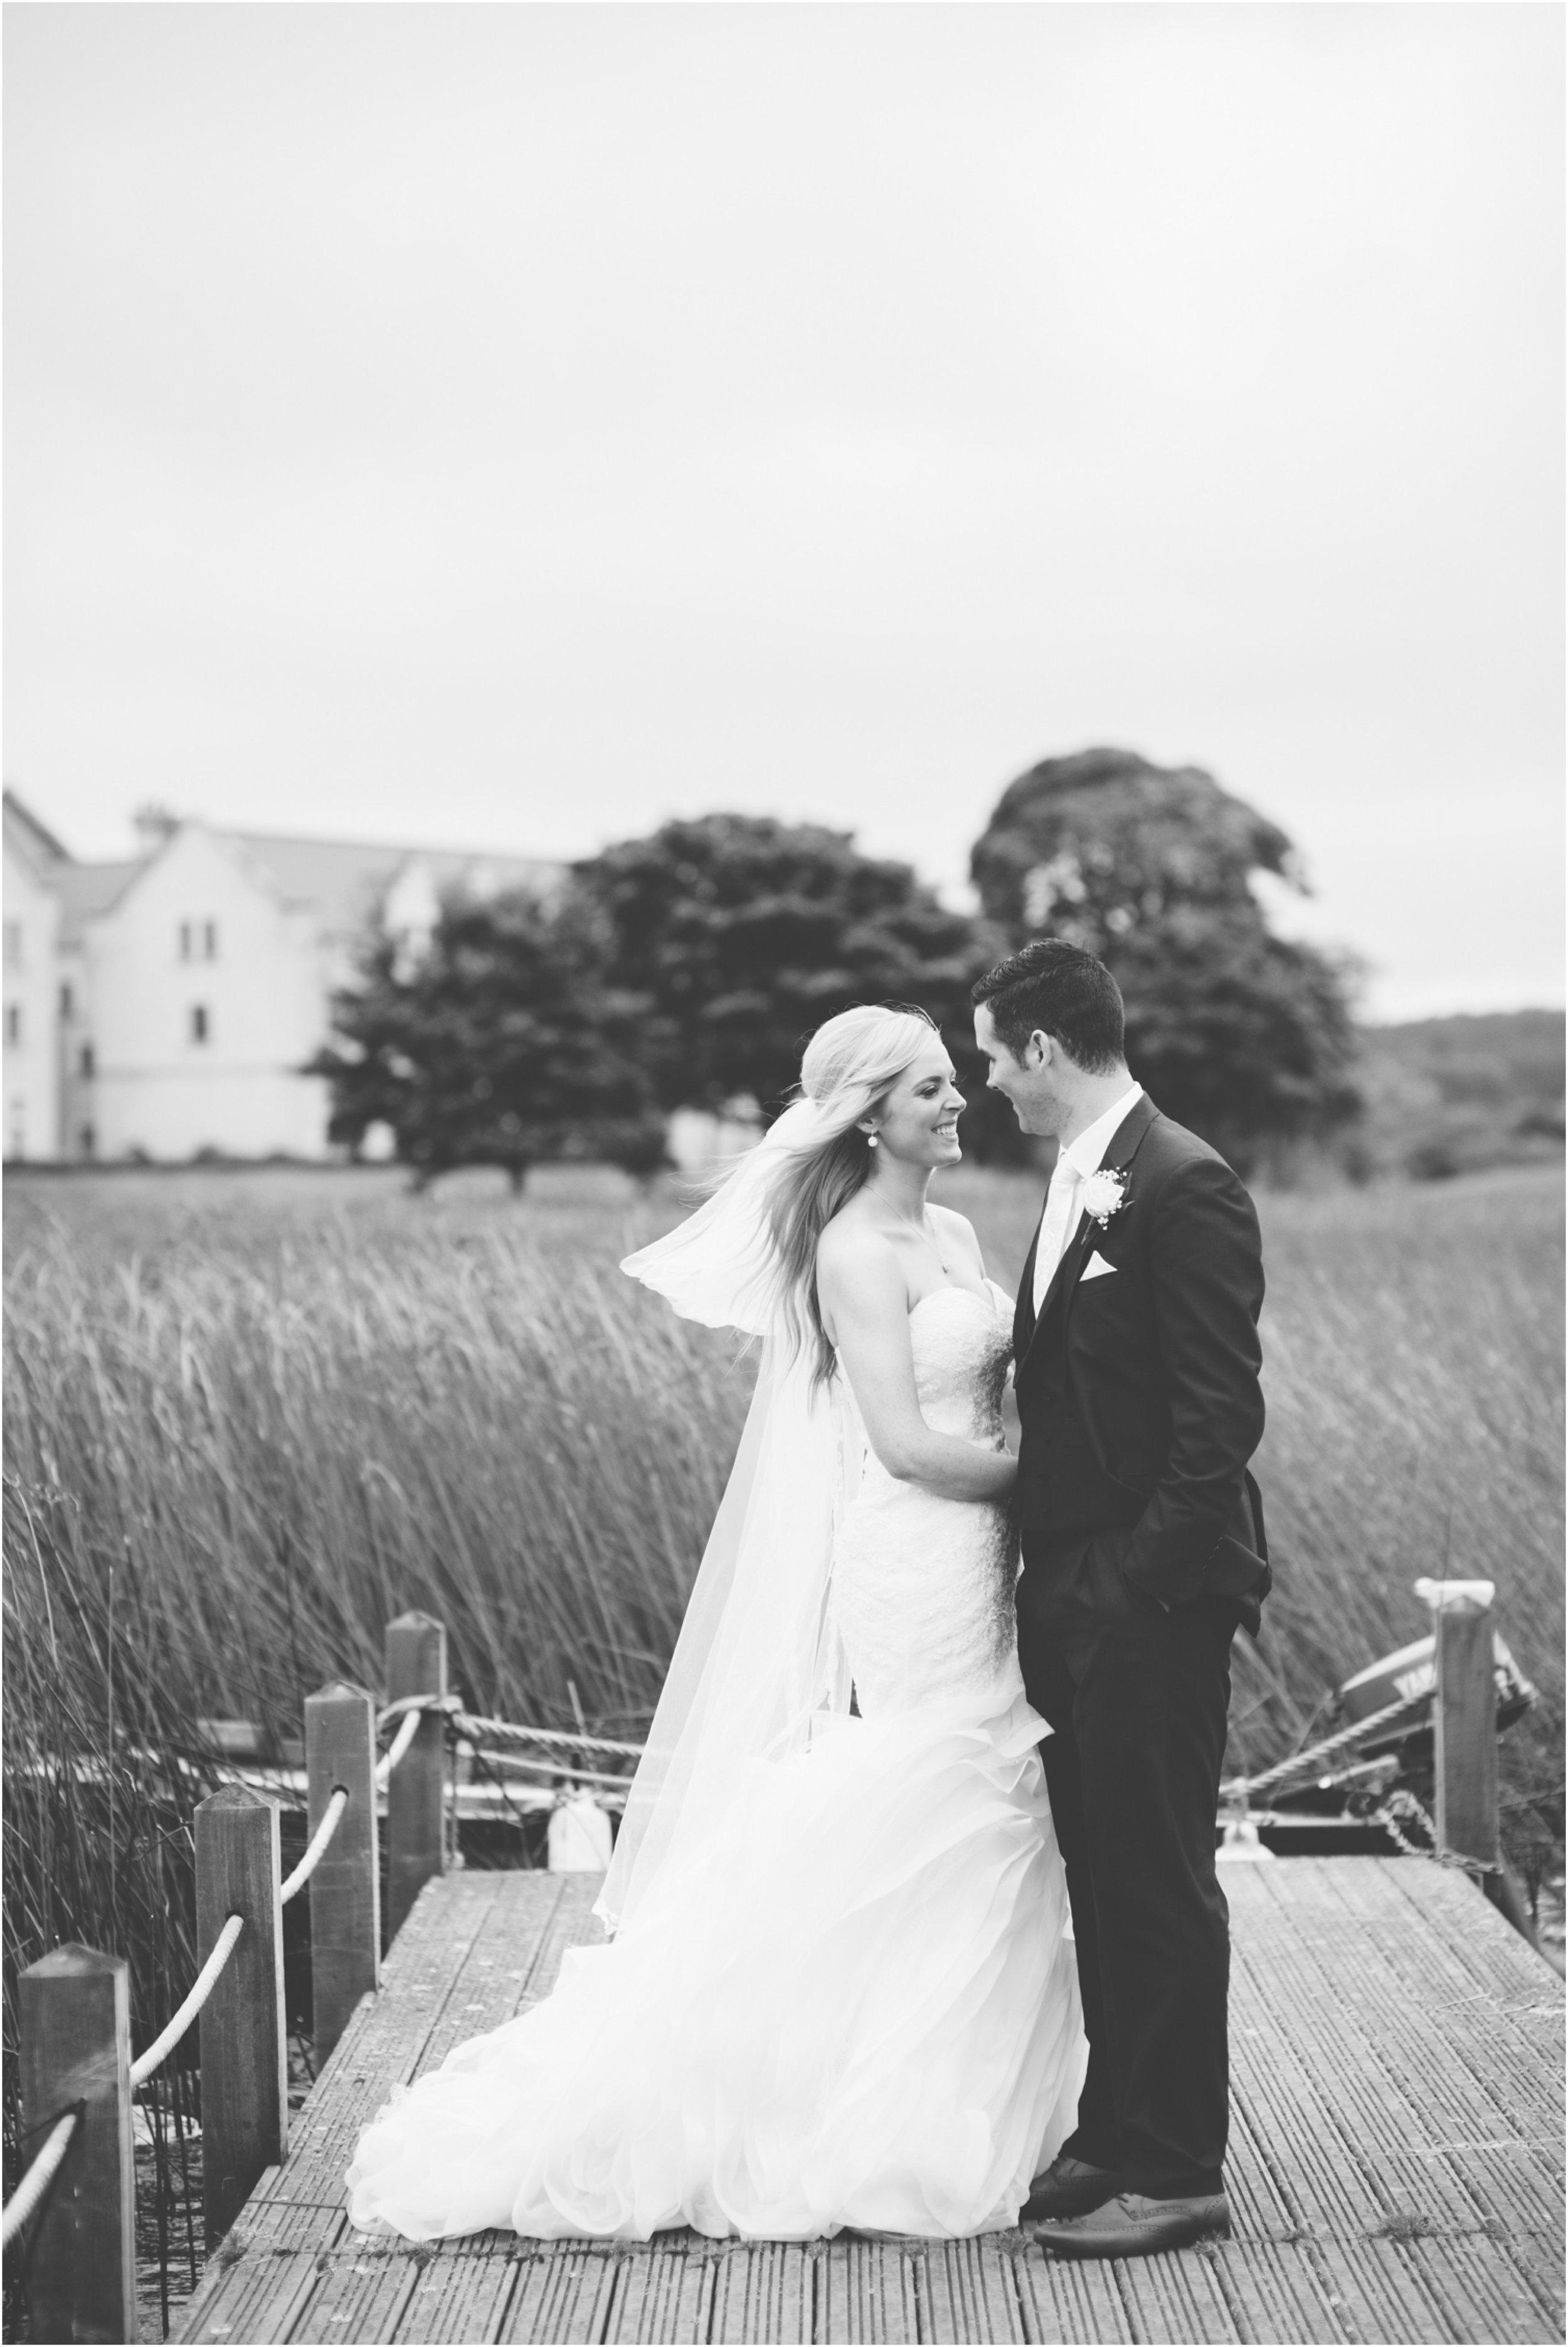 laura-lee-stephen-lough-erne-resort-wedding-photography-co-fermanagh_0072.jpg